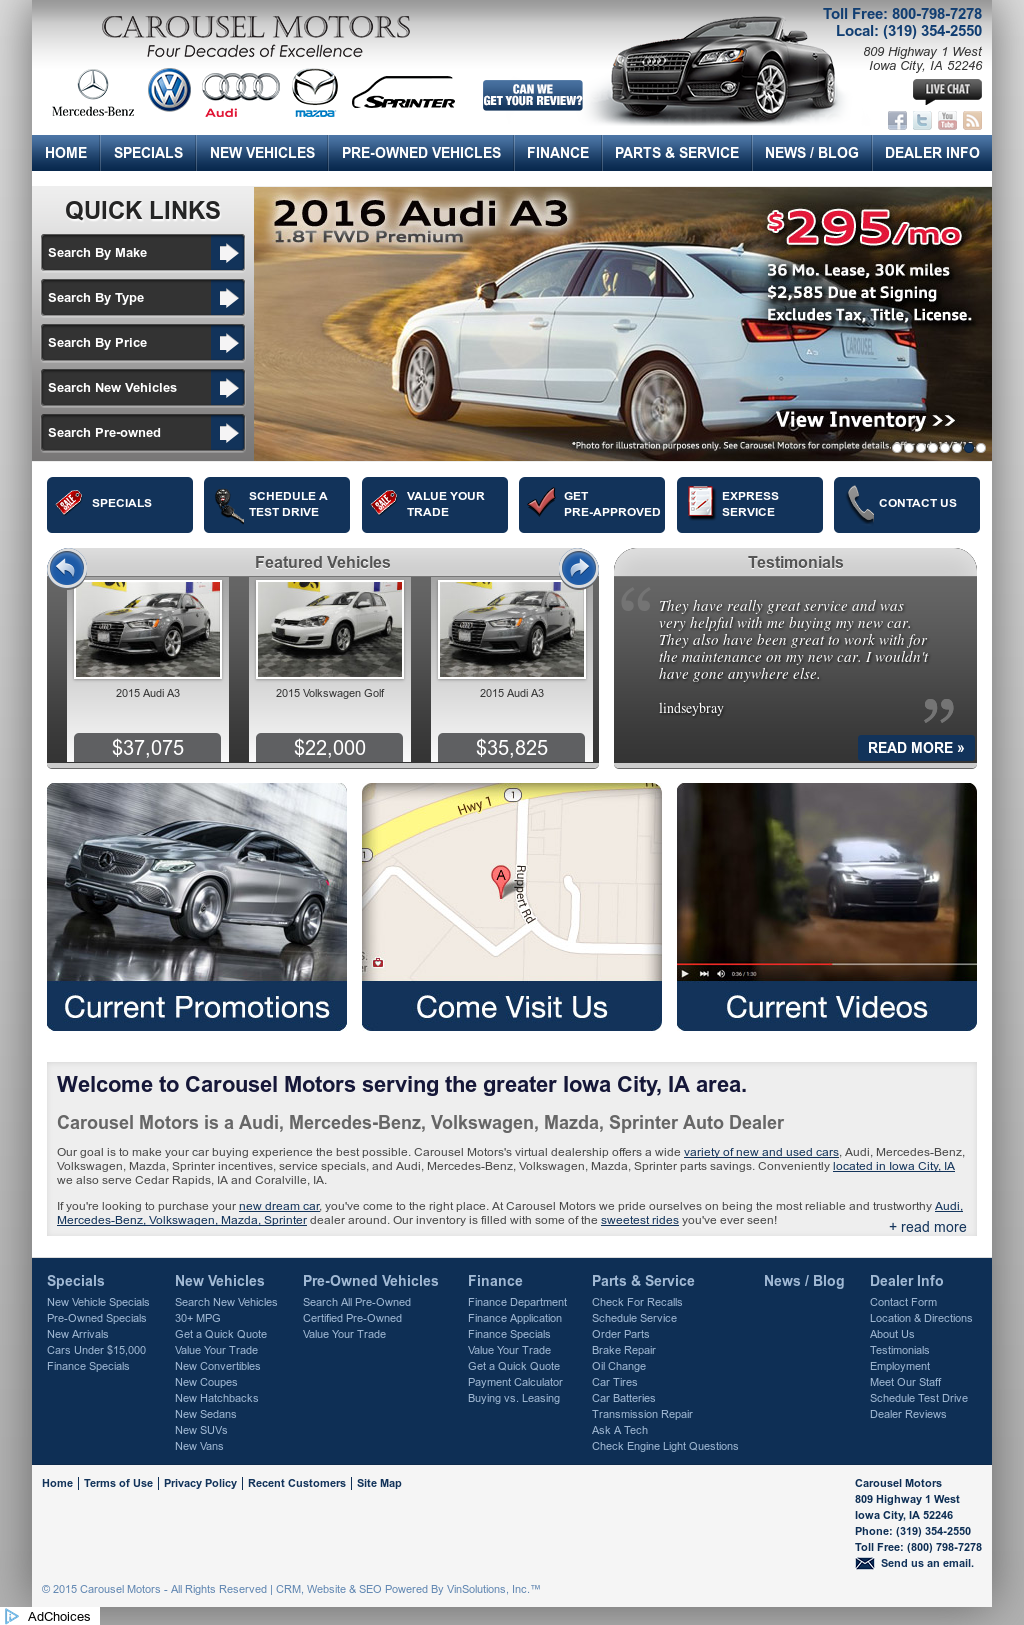 Carousel Motors Iowa City >> Carousel Motors Iowa City Ia - impremedia.net